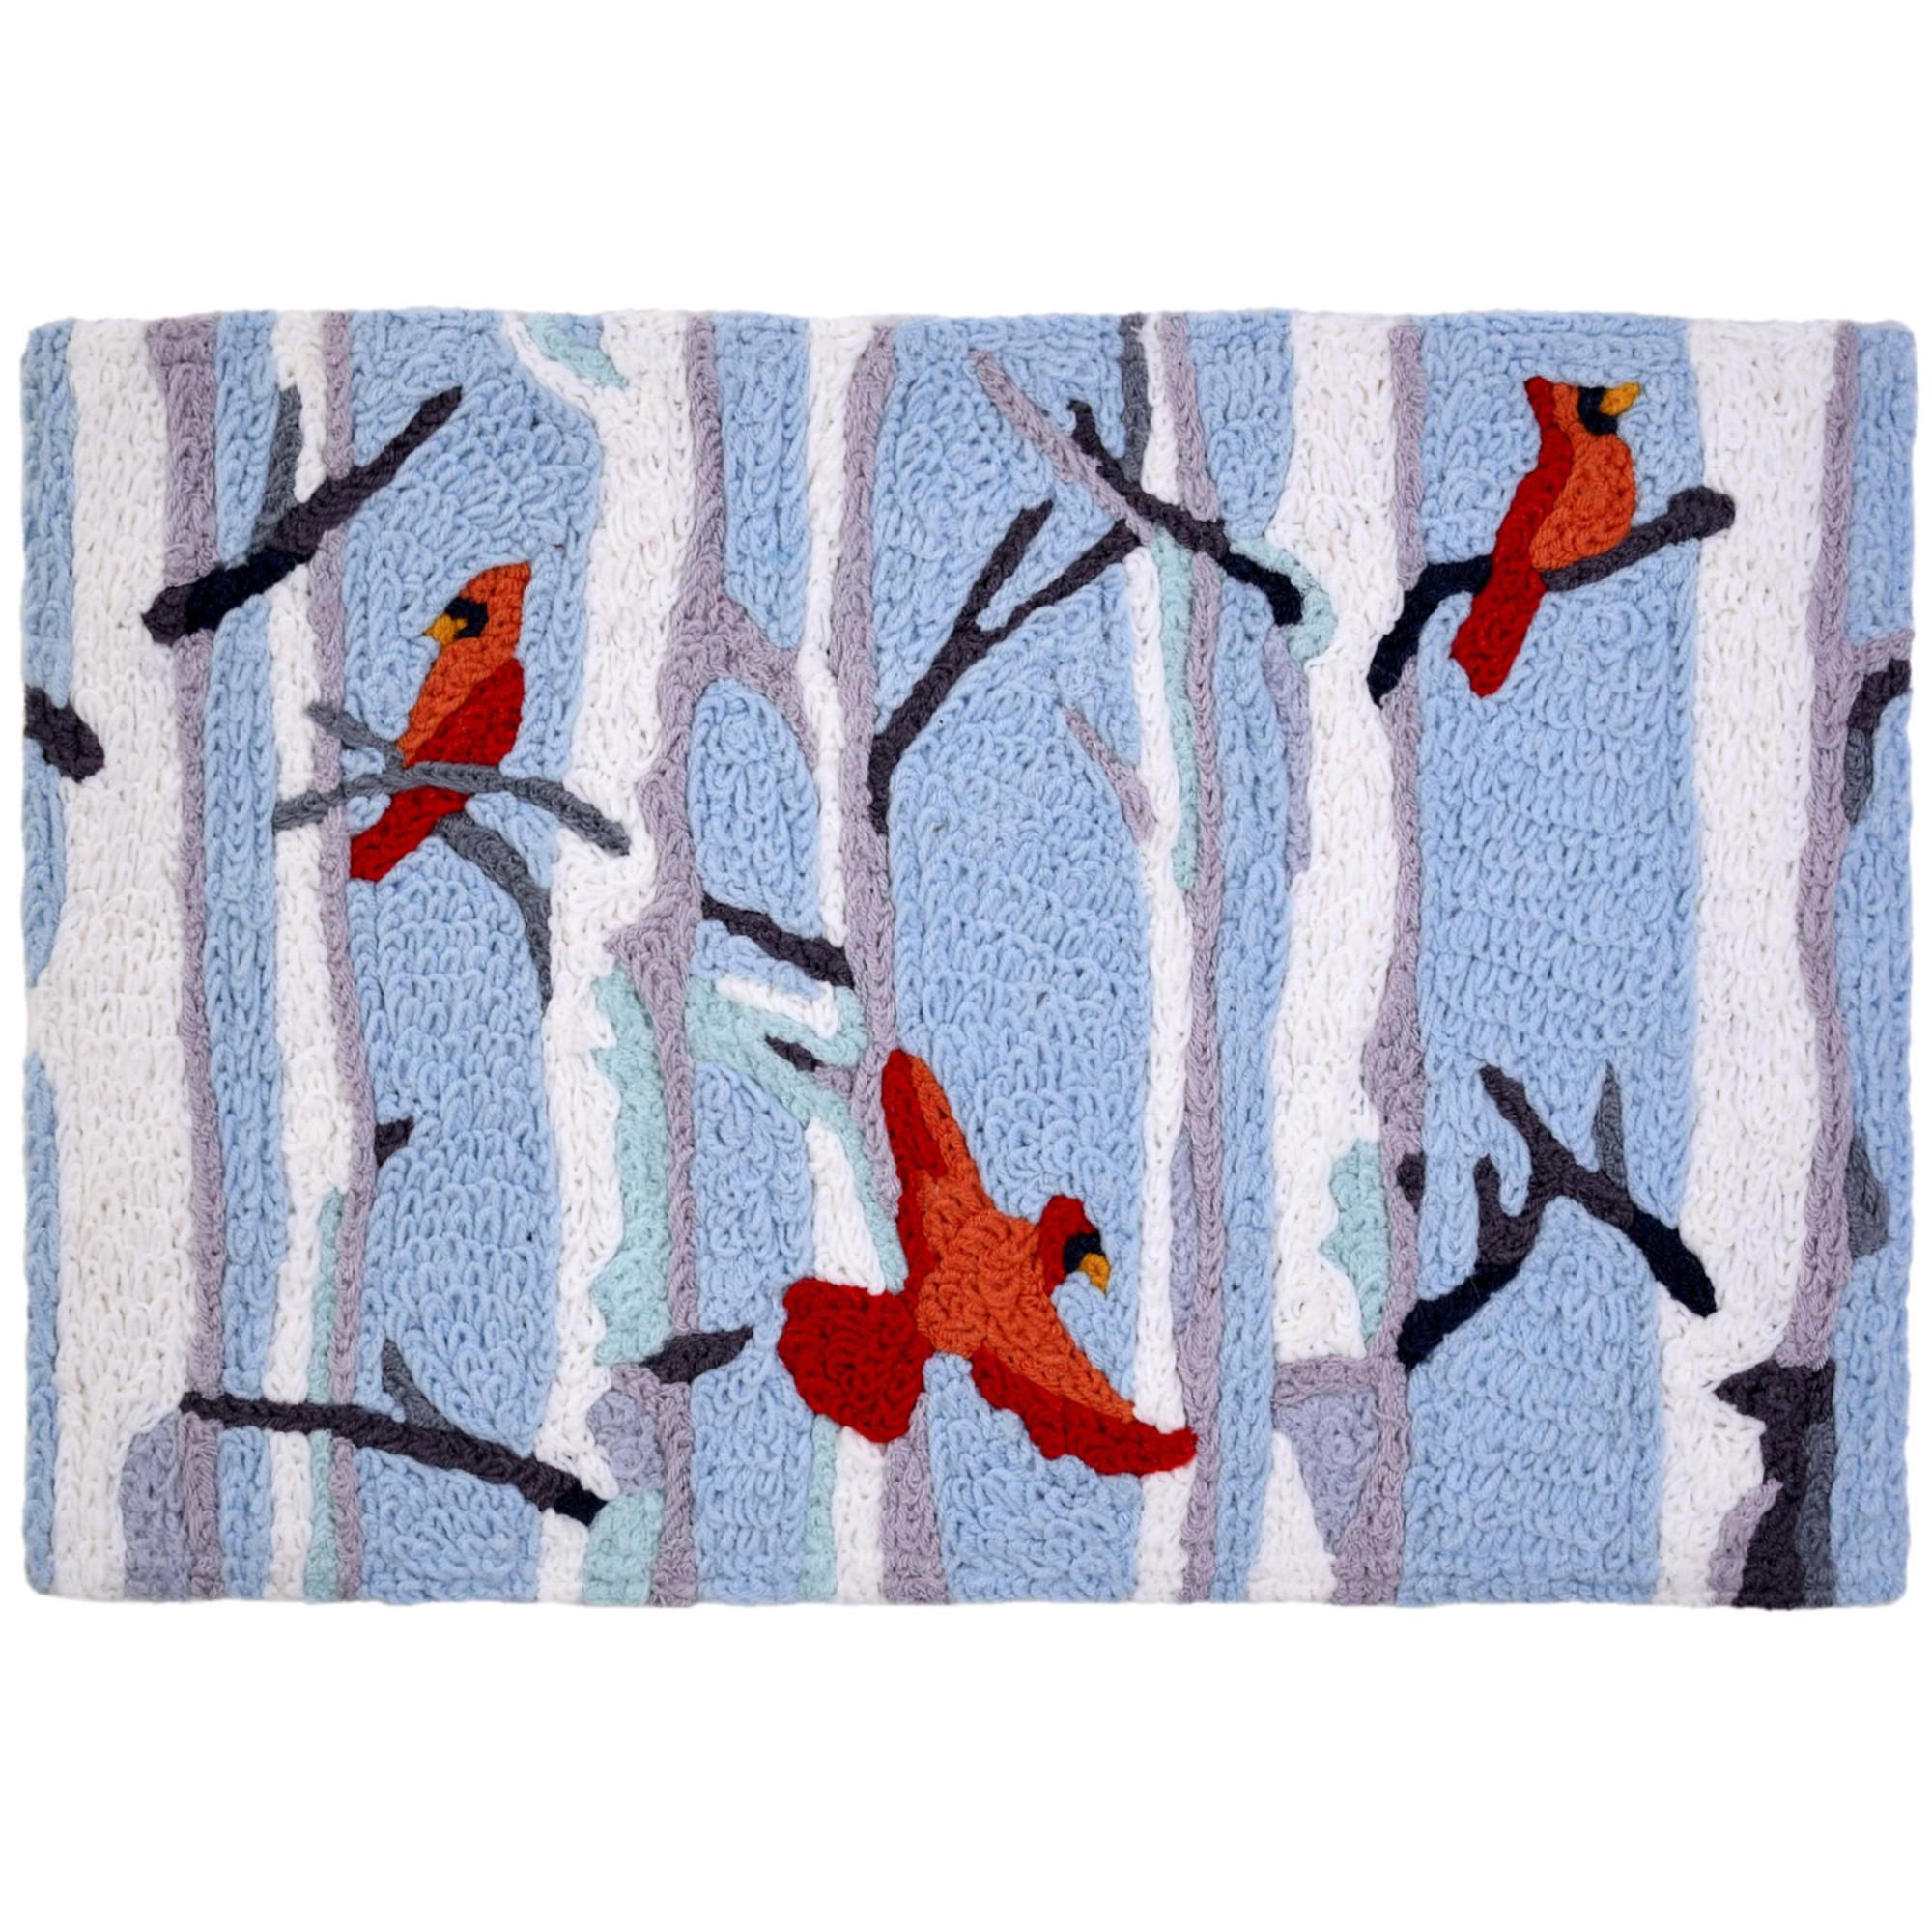 Cardinals in Birch Forest Cardinals Rug Christmas Rug 20 x 30 Jellybean Accent Rug